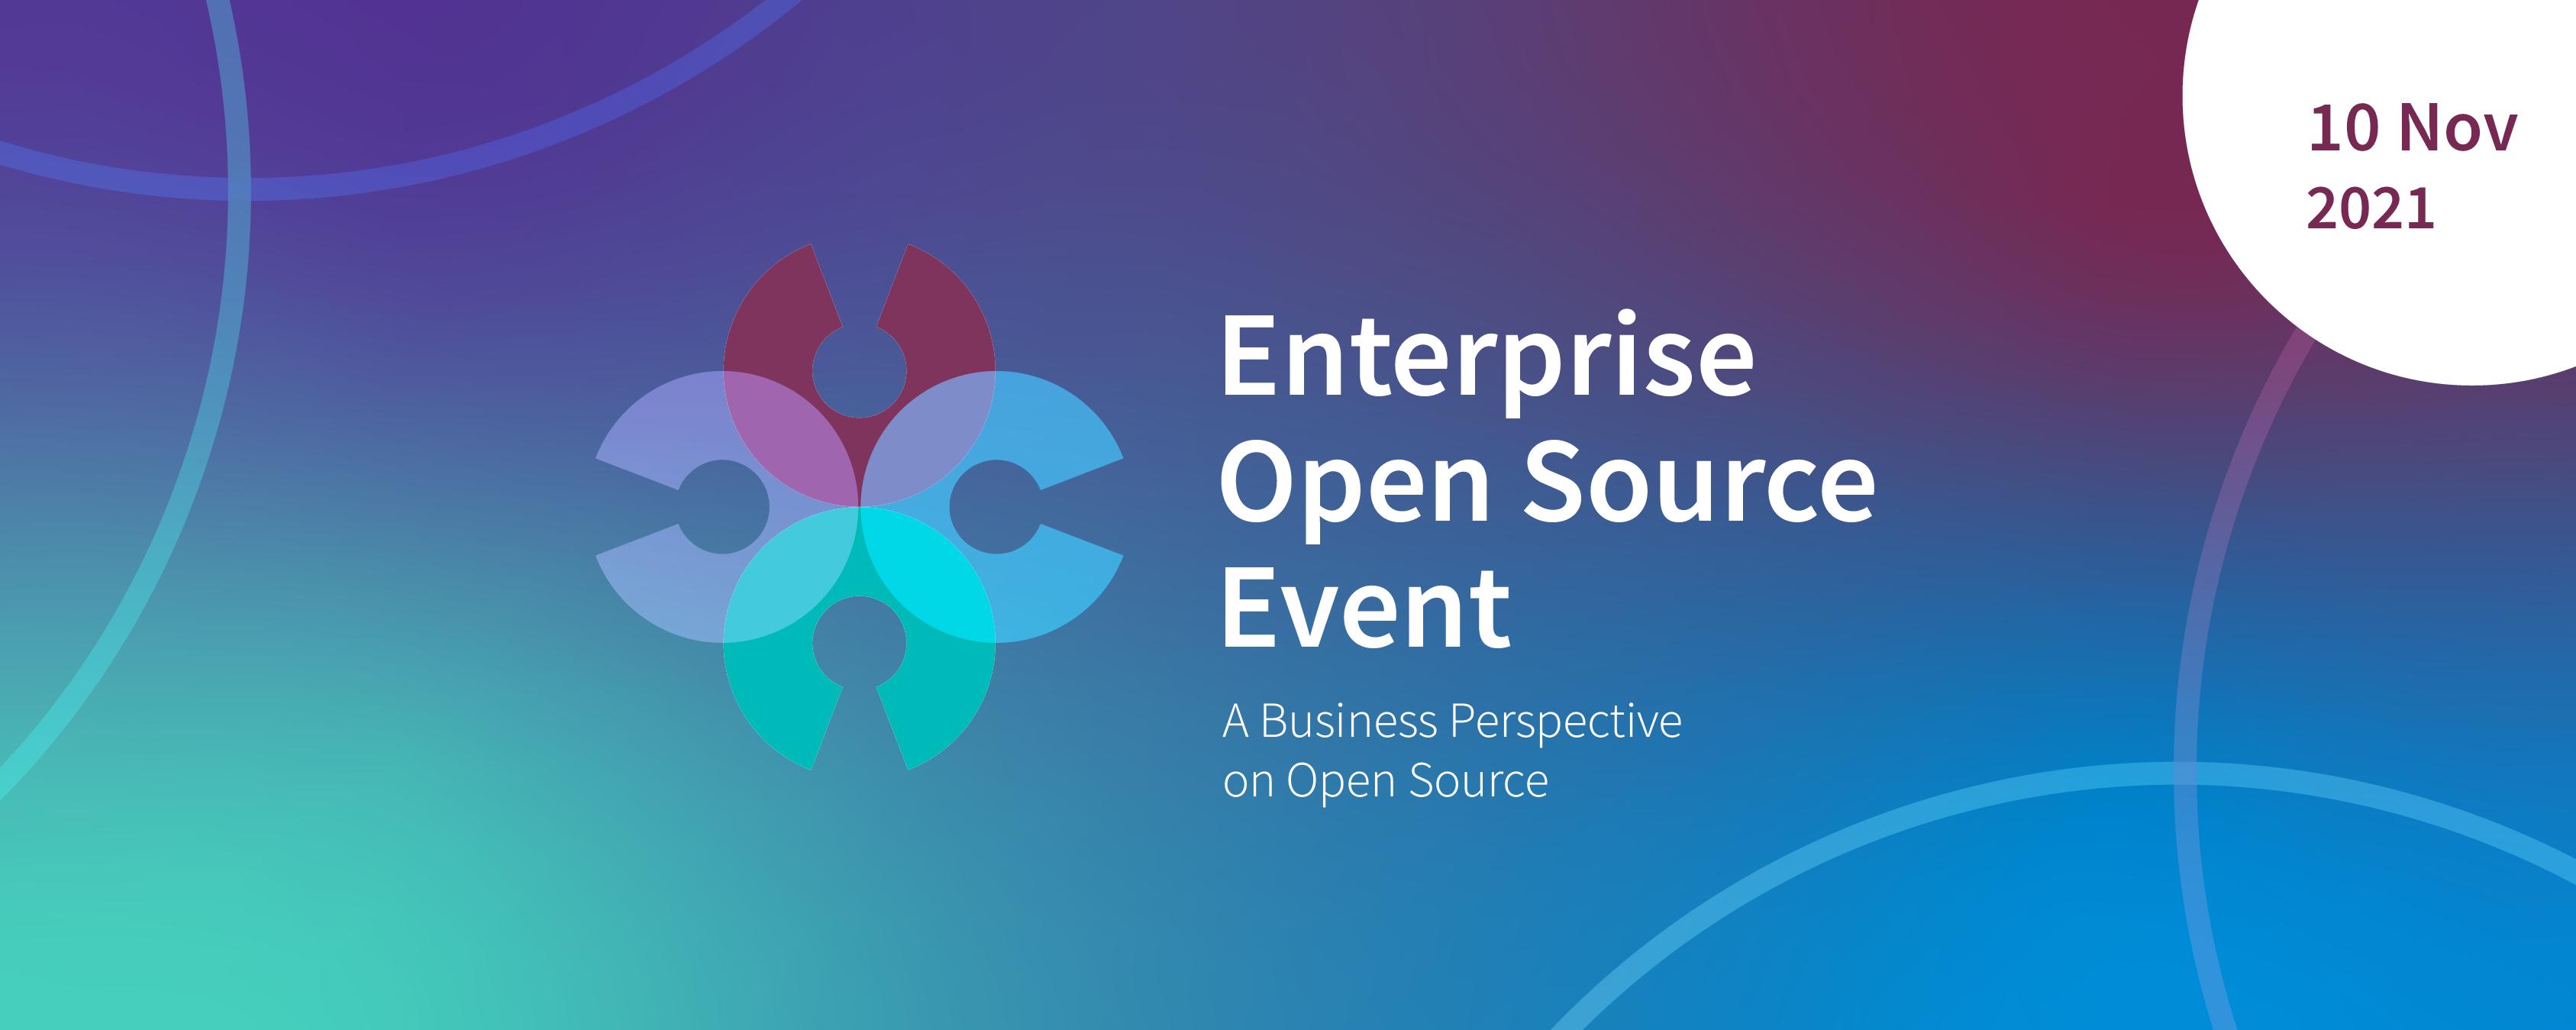 Enterprise Open Source